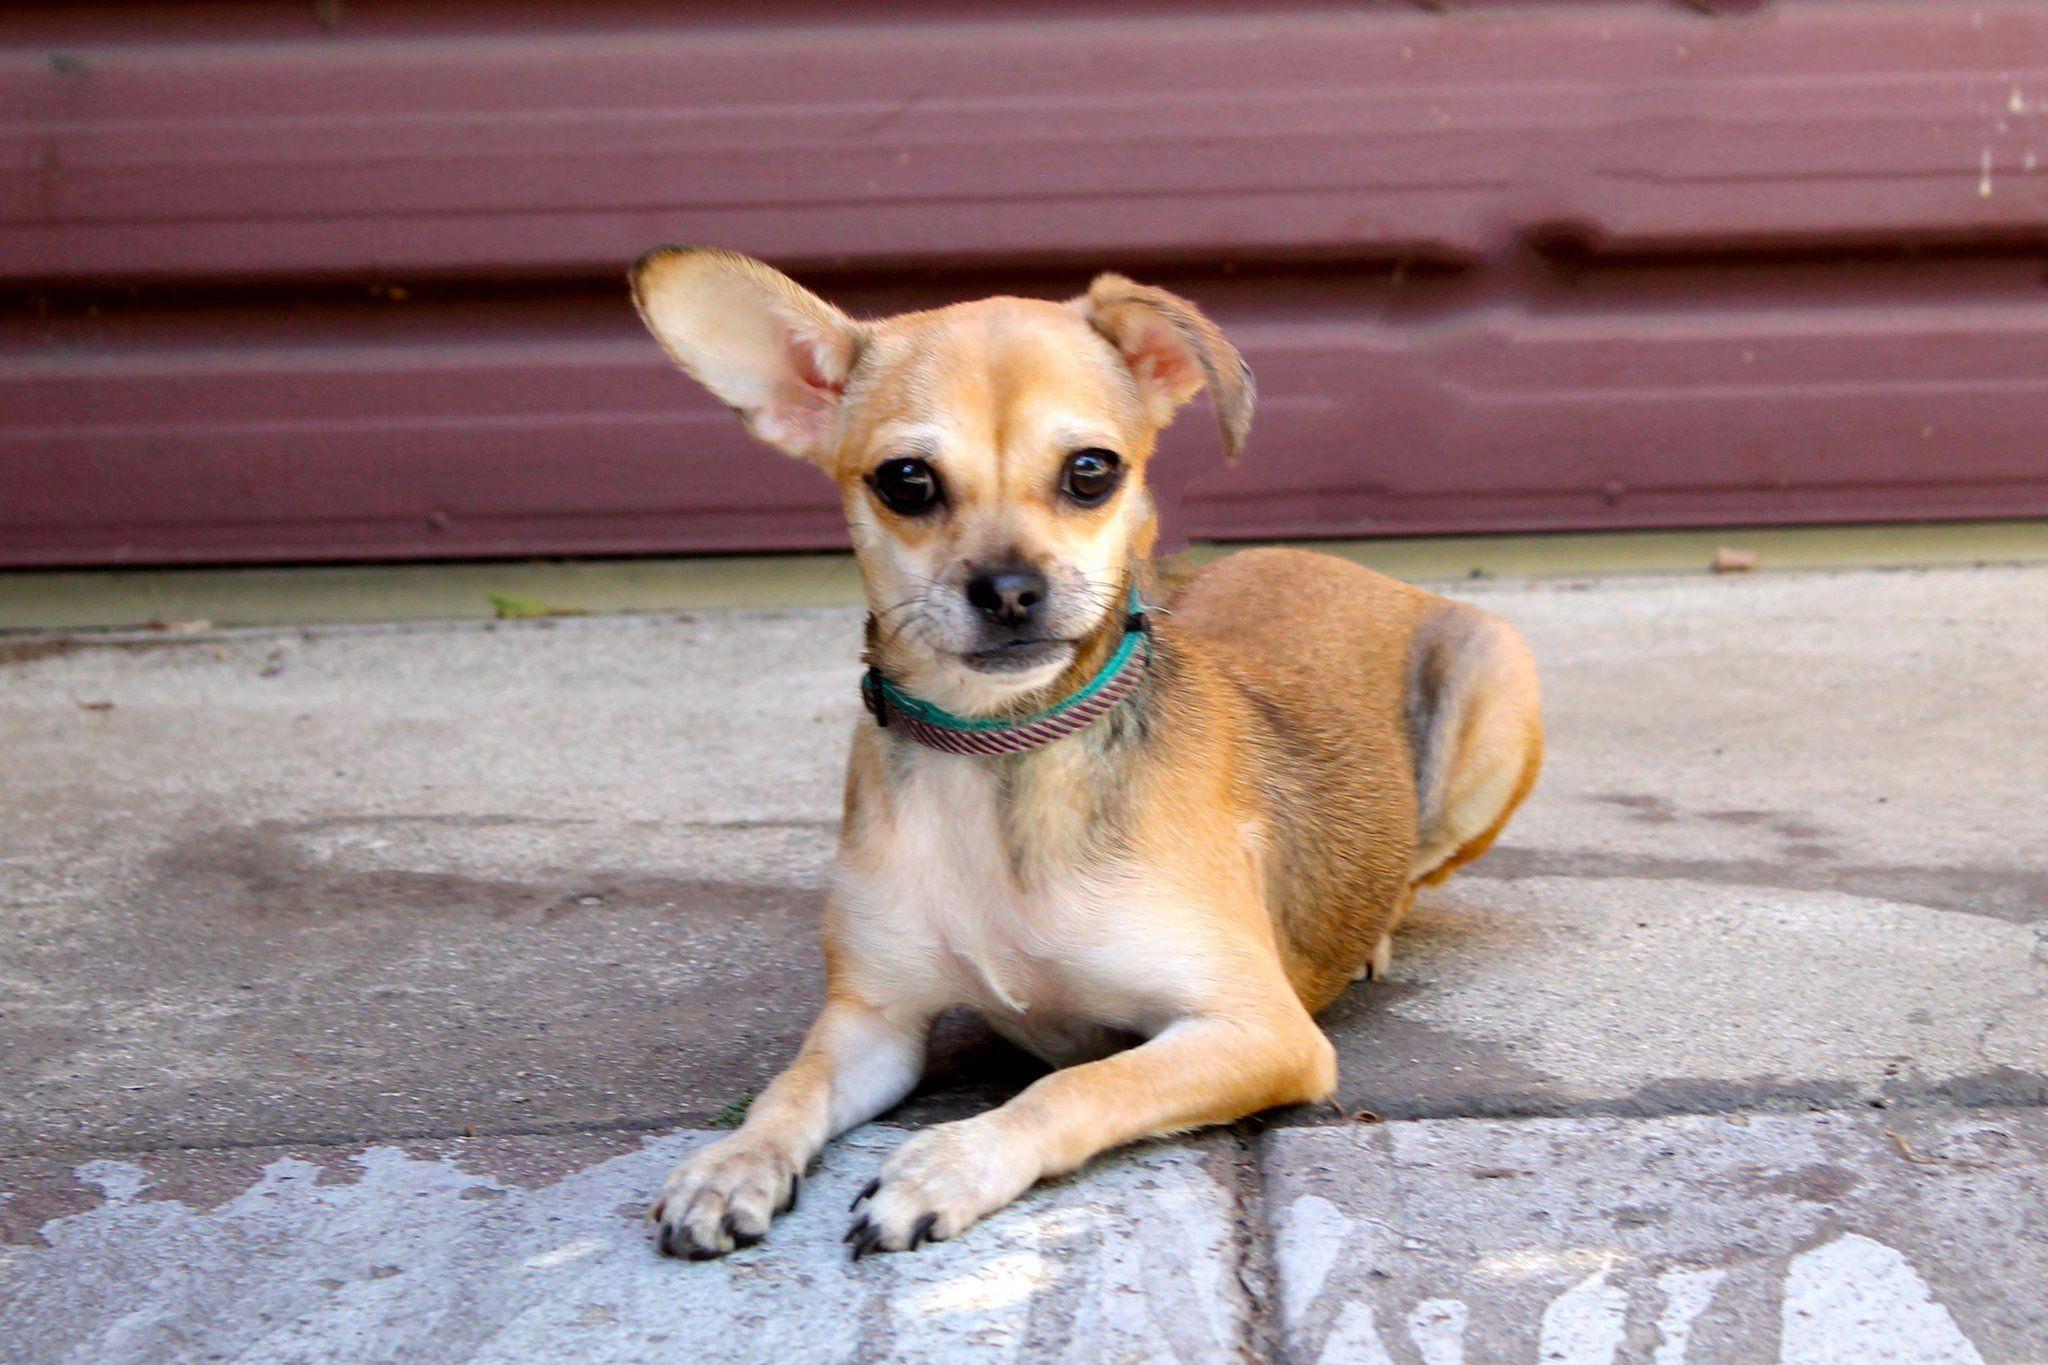 Gayweho Dogs 4 U On Pet Adoption Pugs Dogs